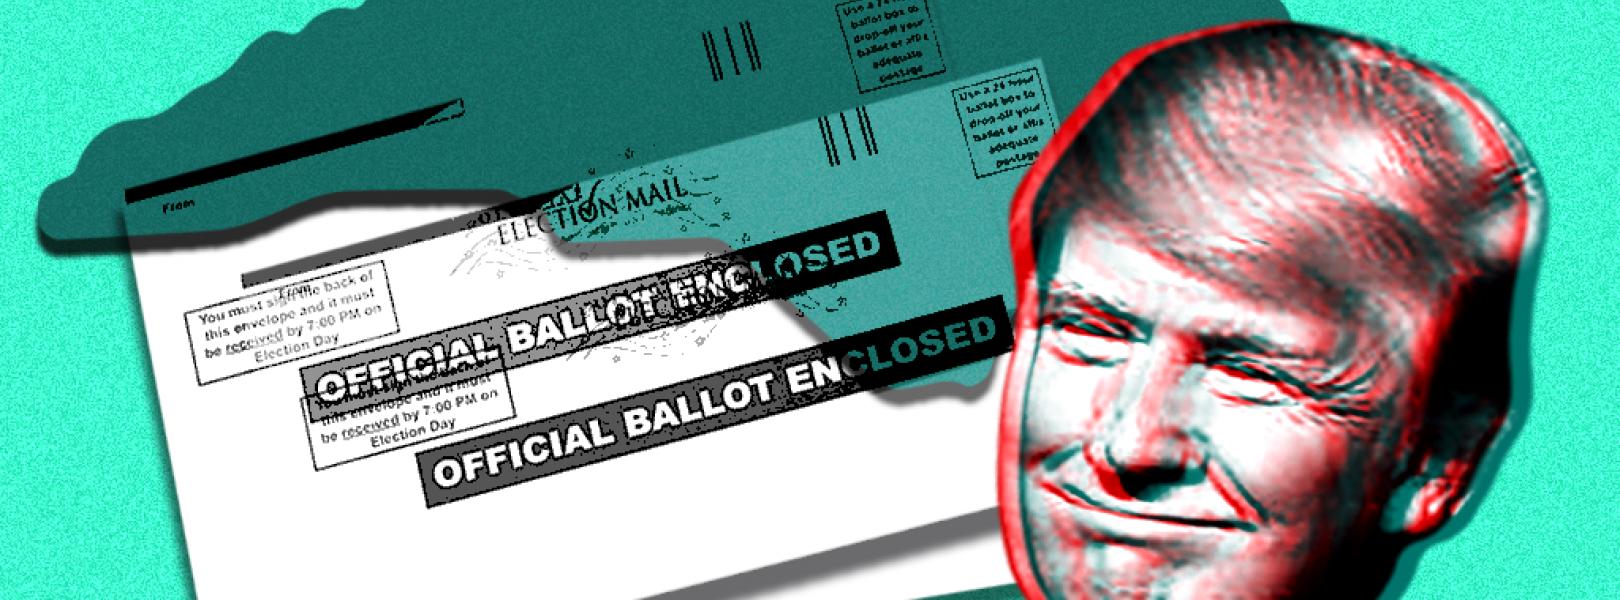 Trump, North Carolina, and some mail-in ballots